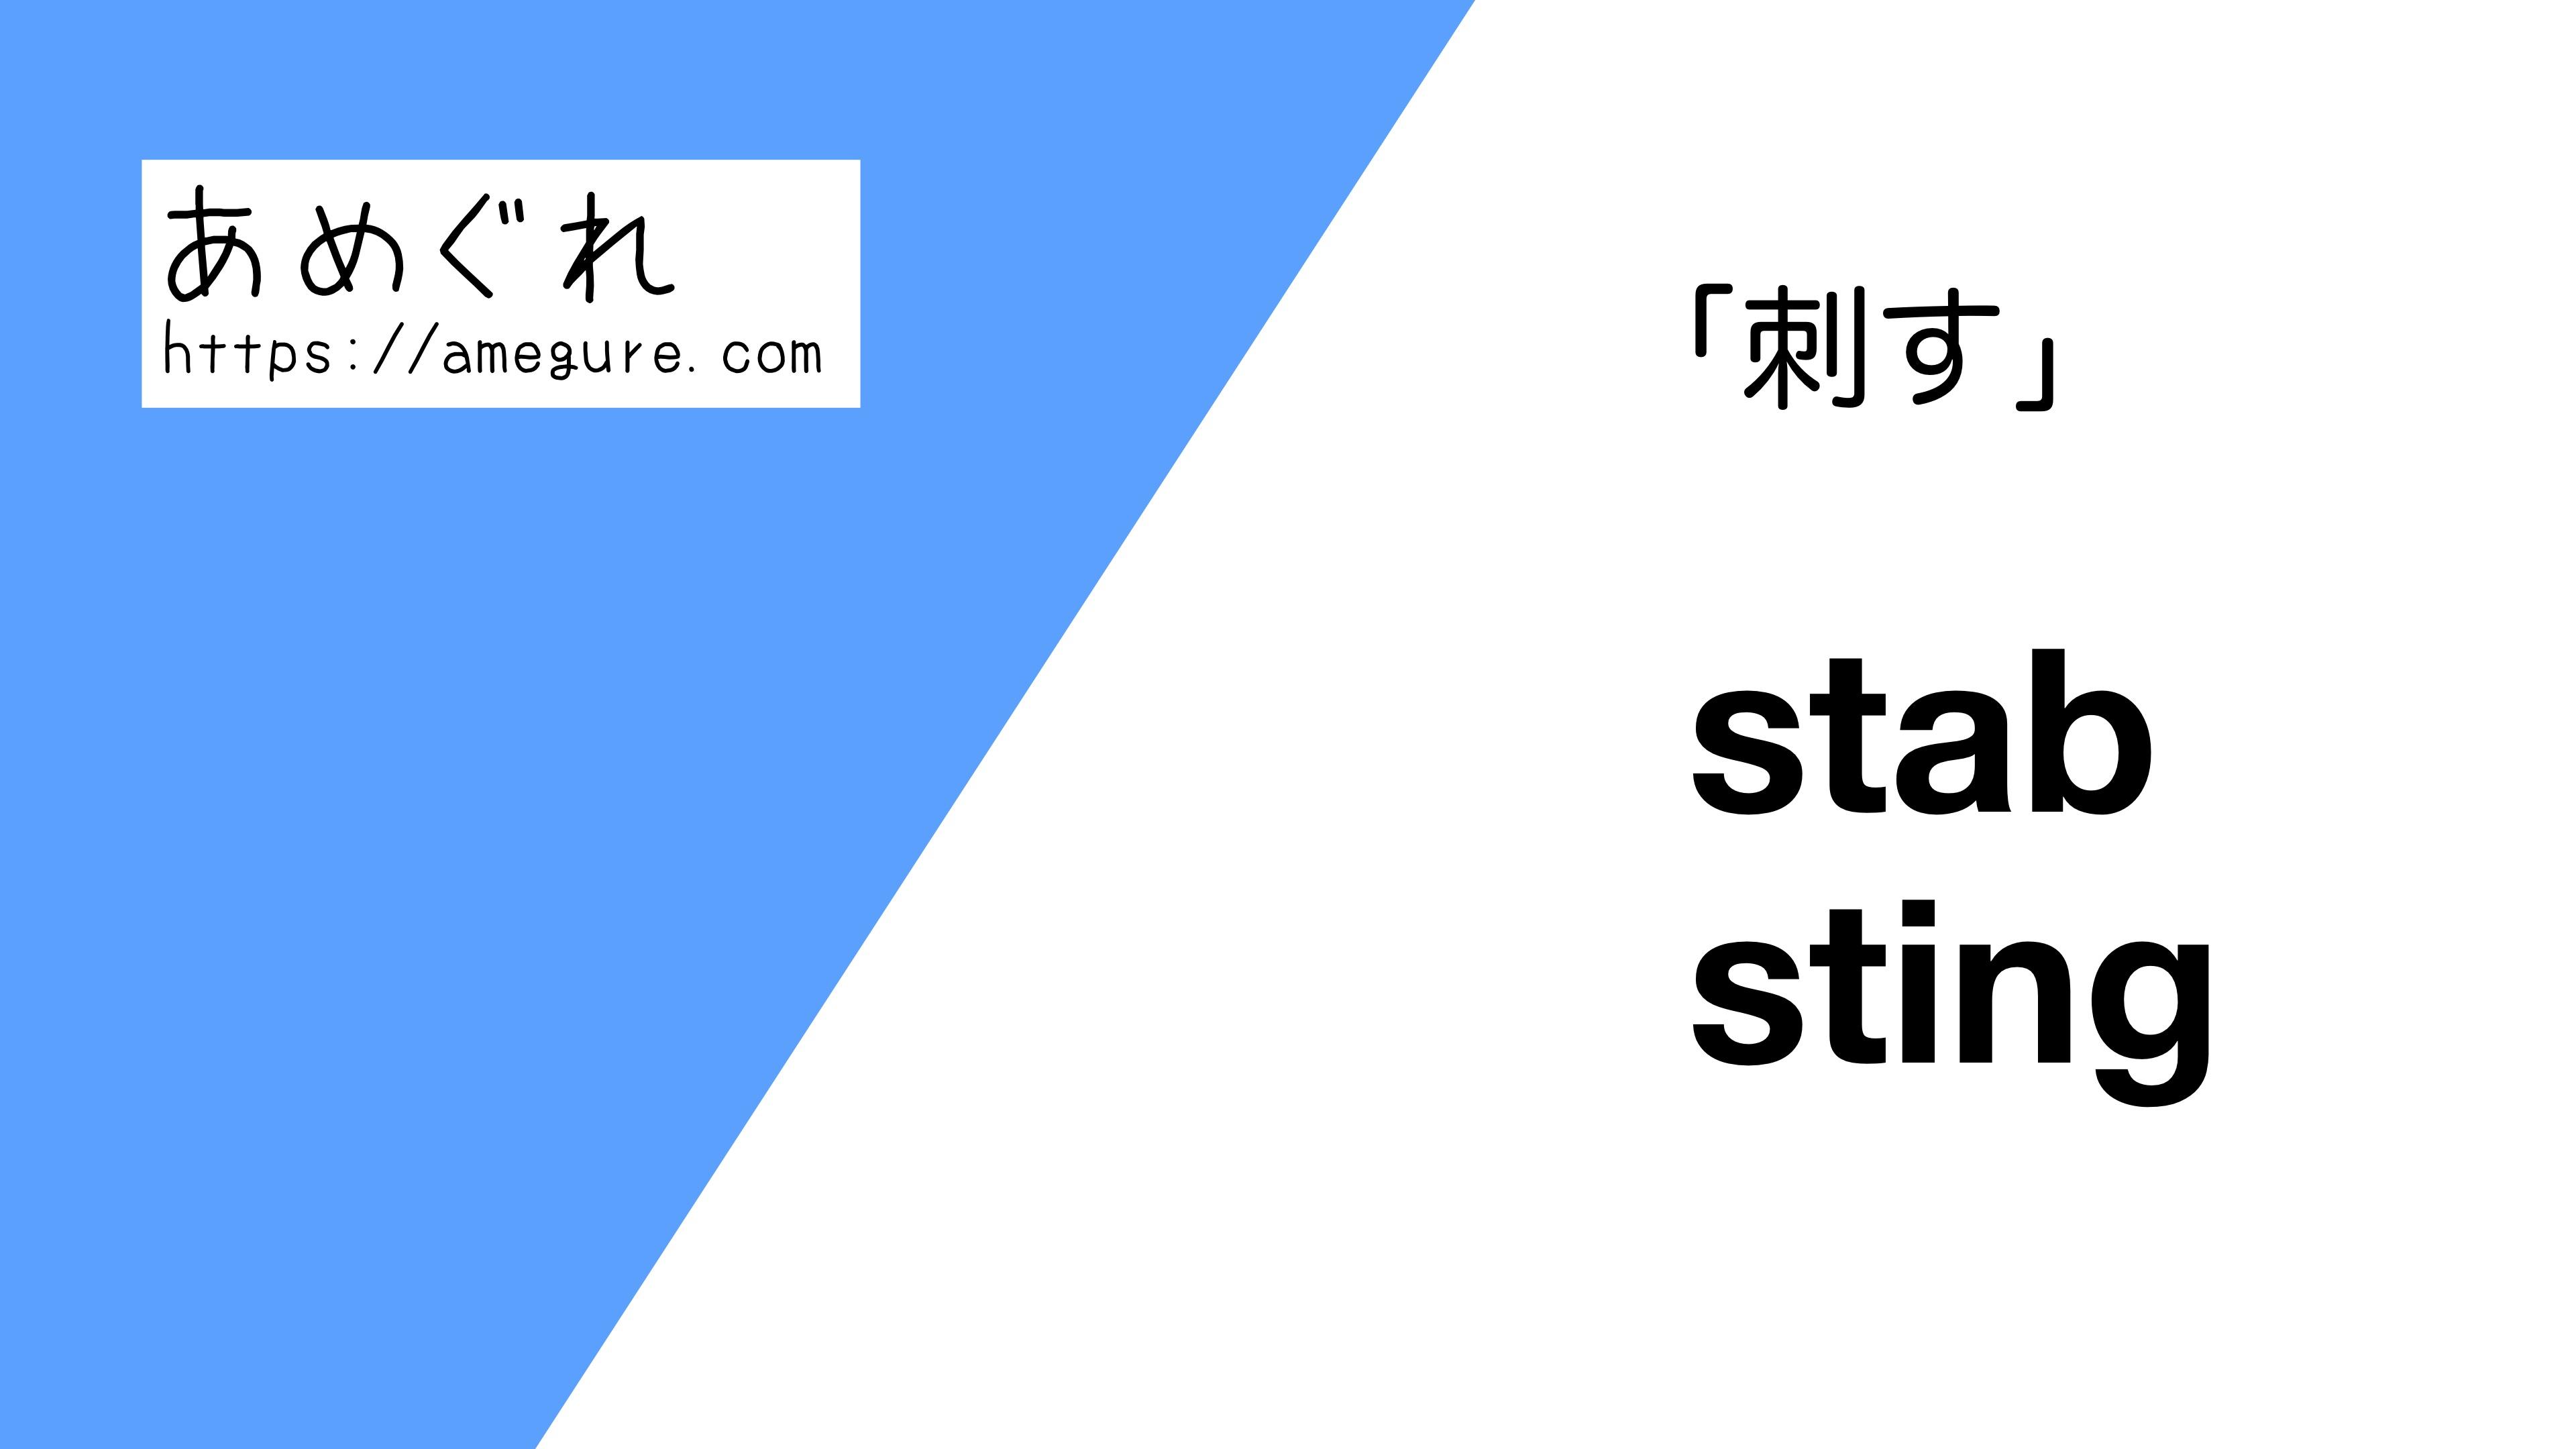 stab-sting違い